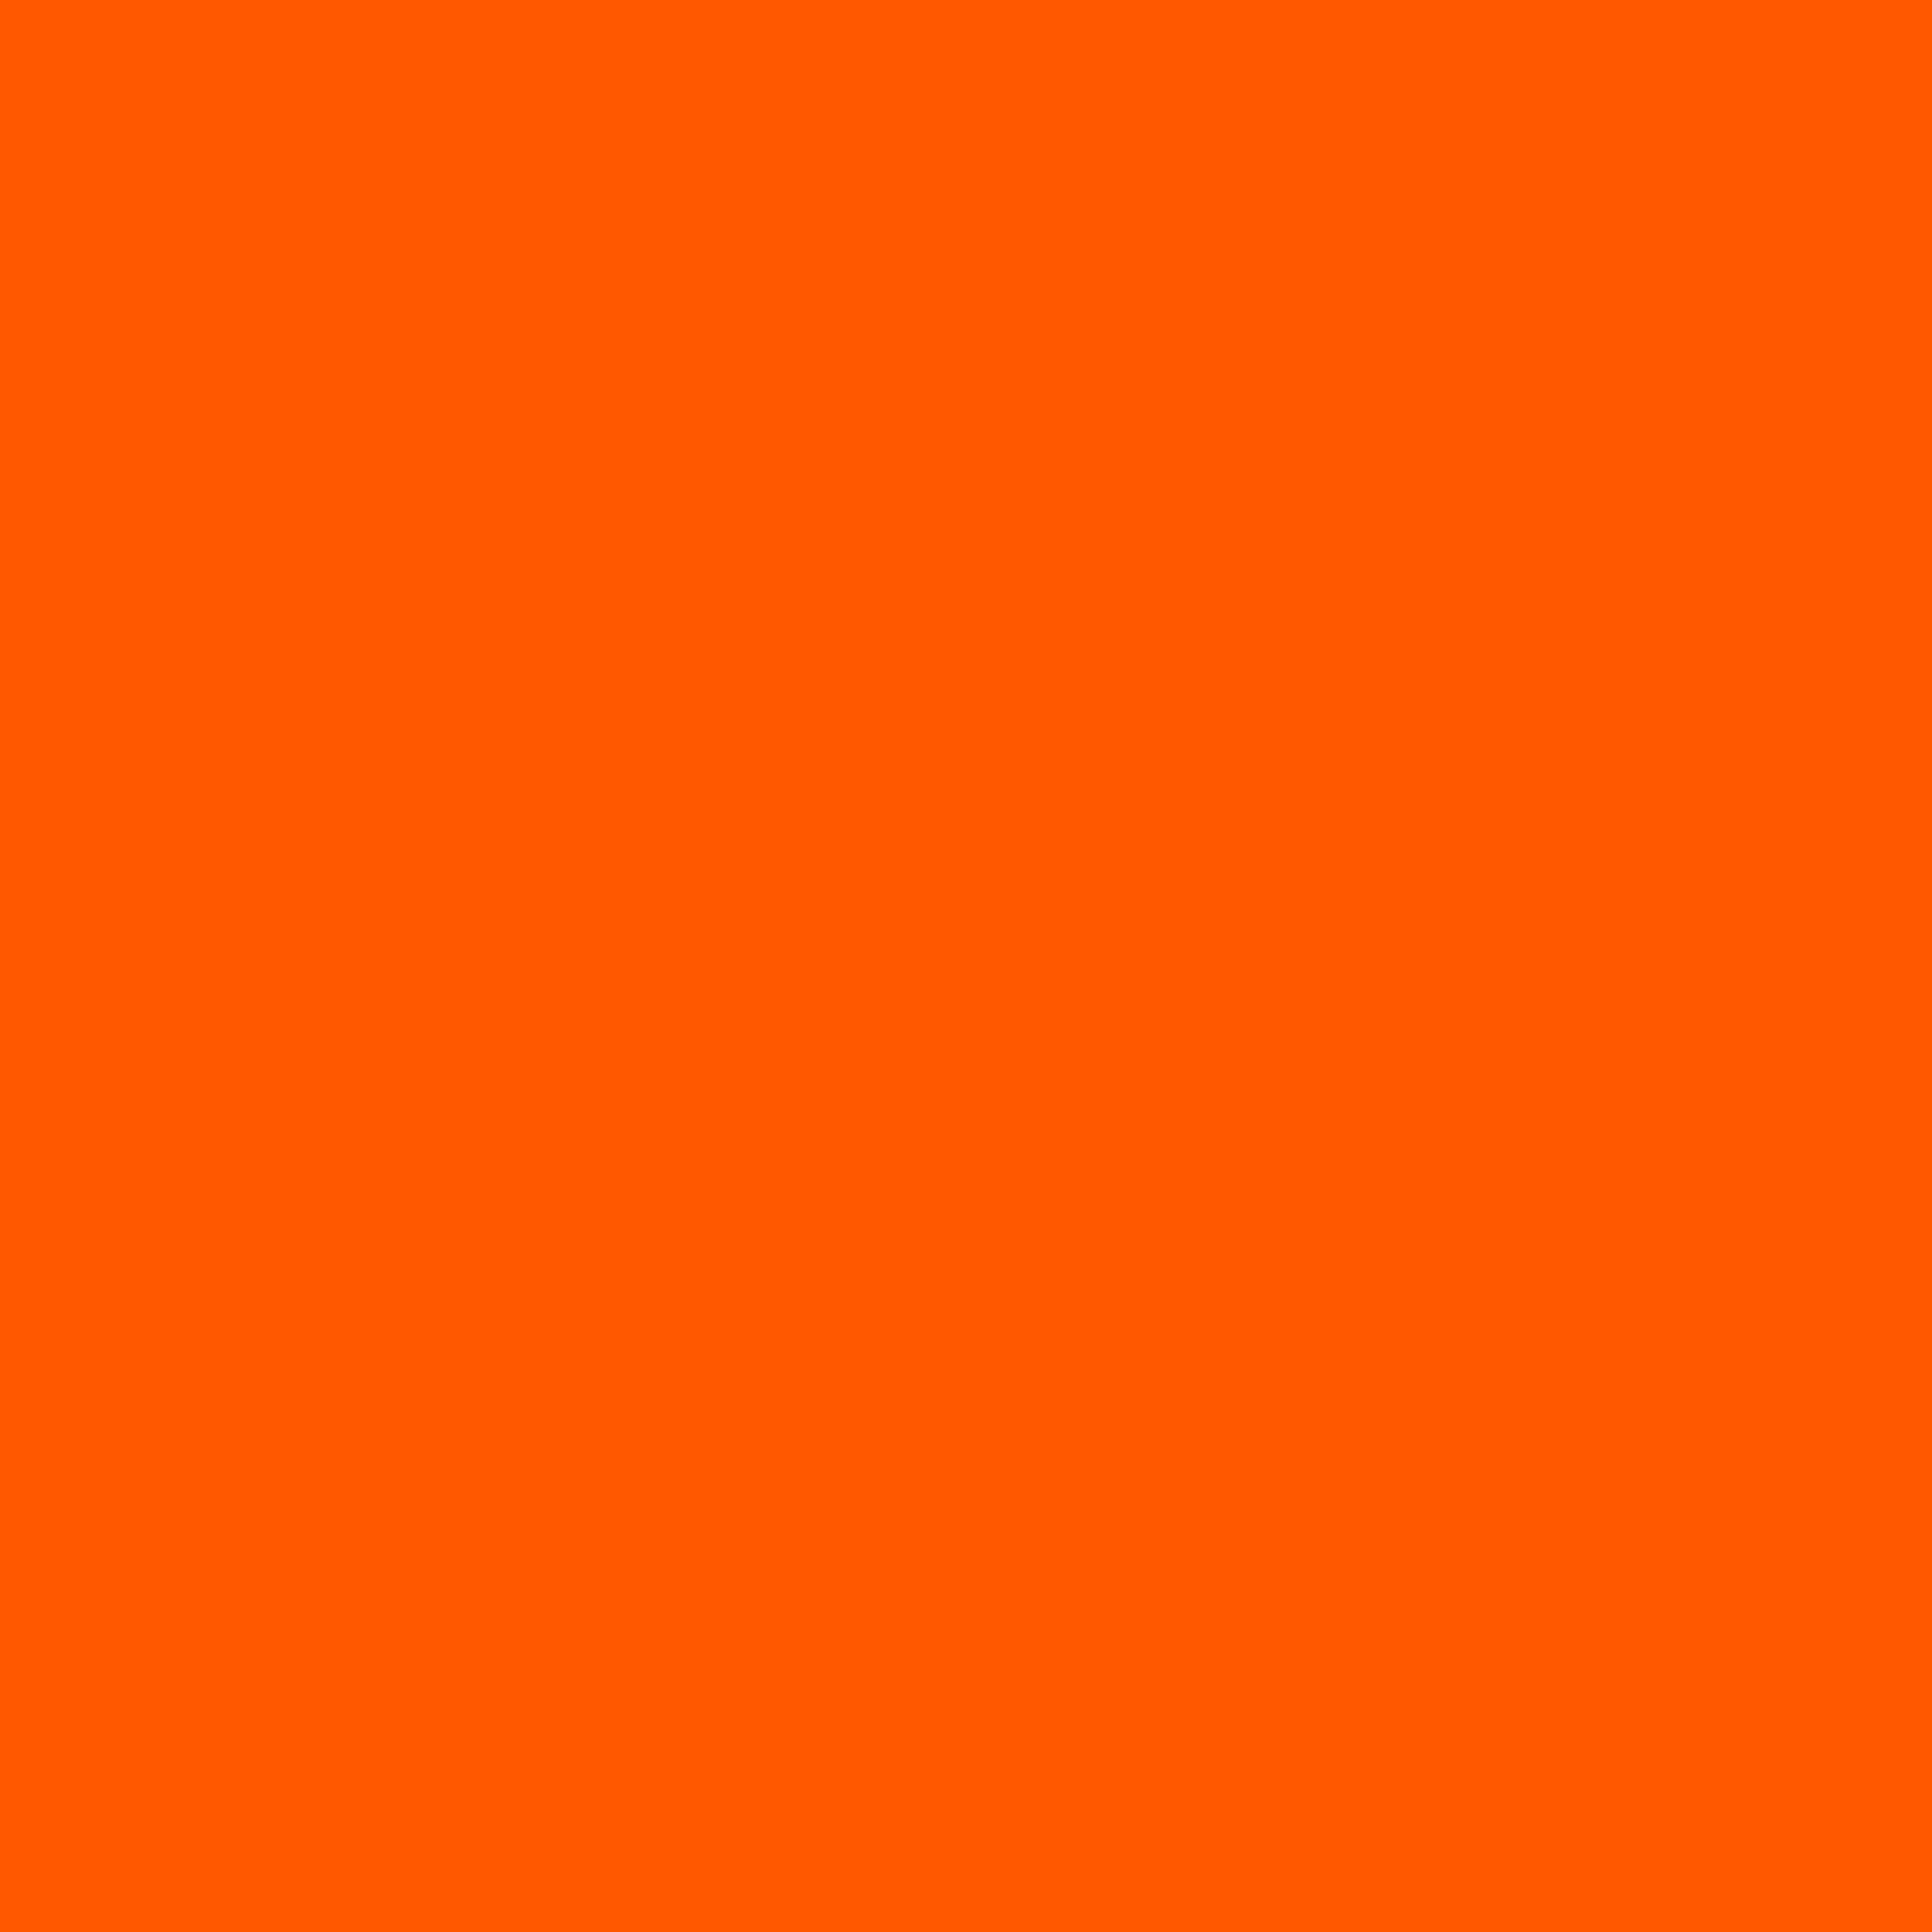 3600x3600 Orange Pantone Solid Color Background